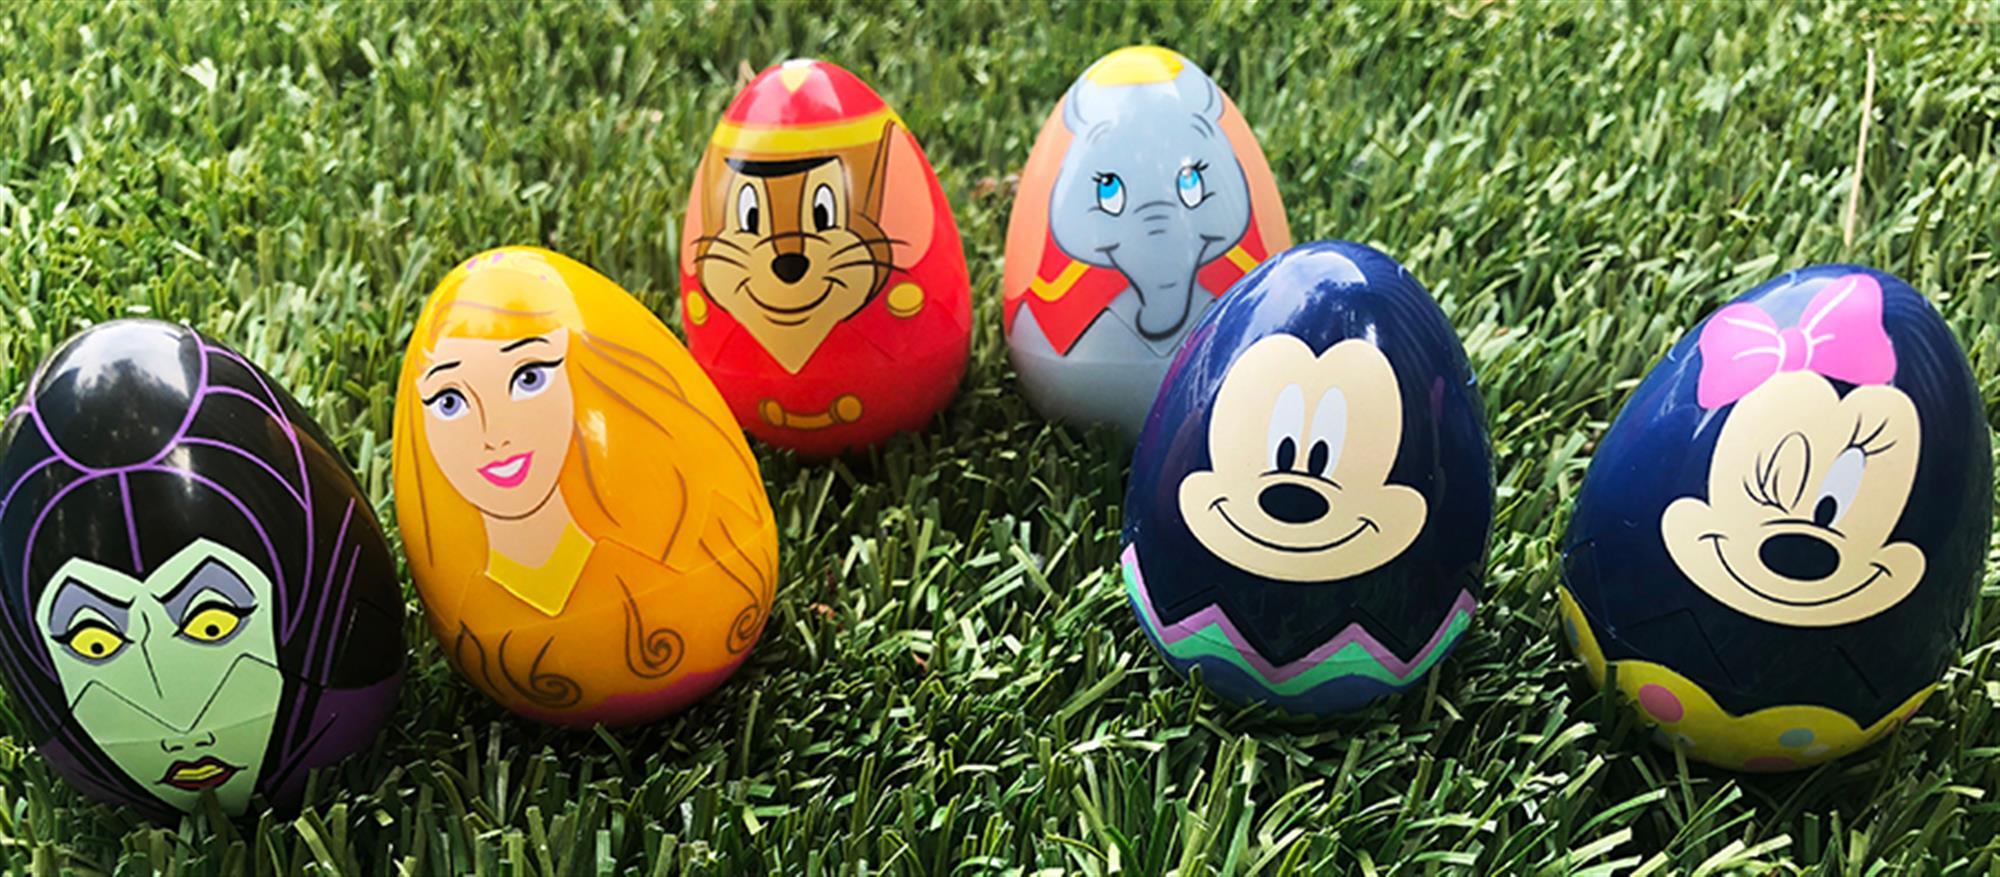 Egg-stravaganza at the Disneyland Resort